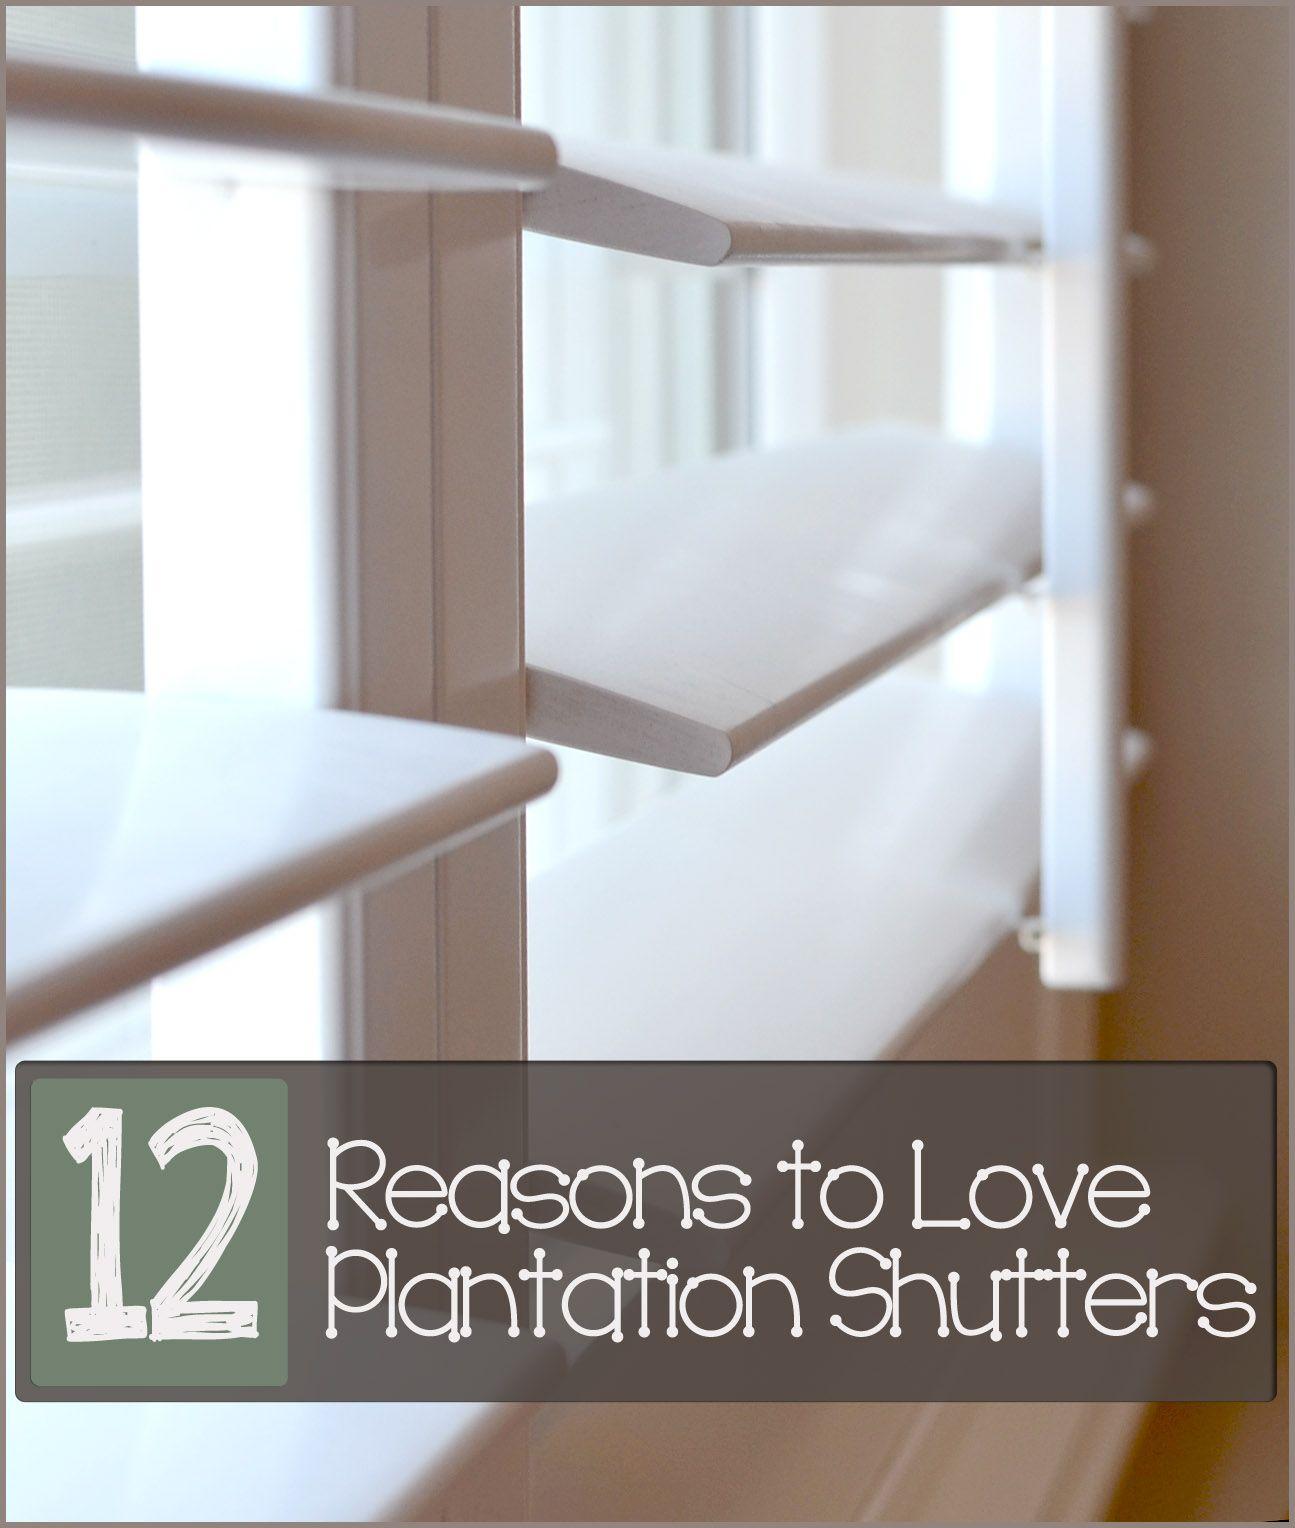 12 Reasons To Love Plantation Shutters